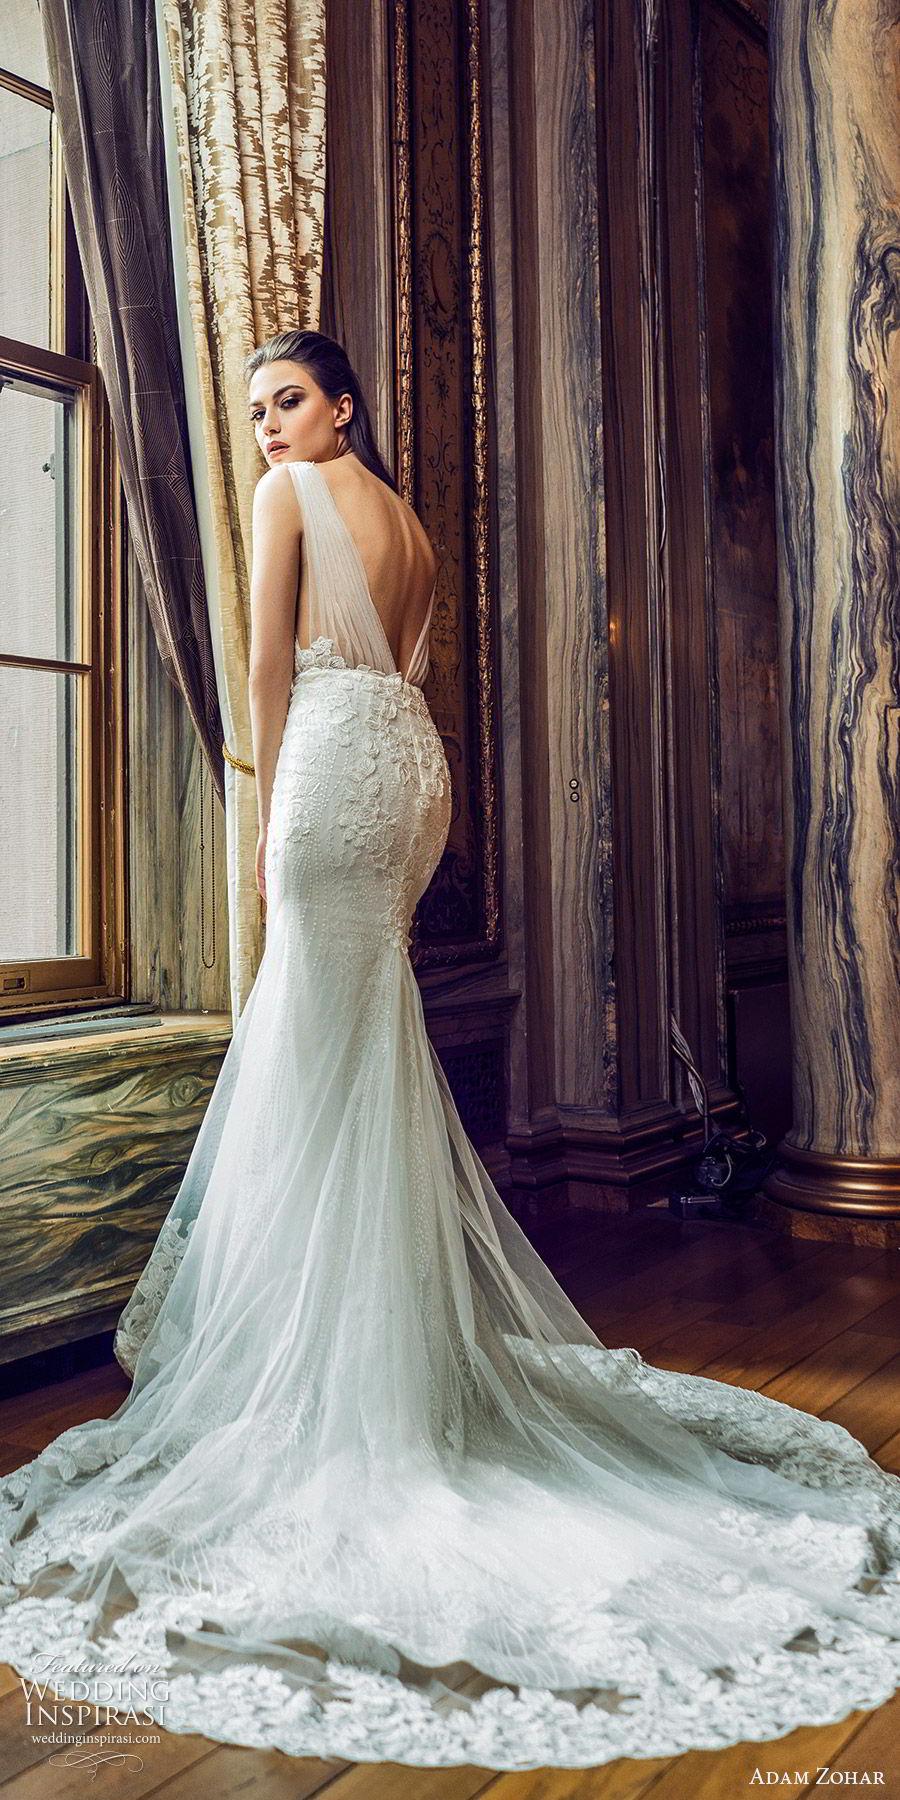 adam zohar 2020 bridal sleeveless ruched straps deep v neckline fully embellished lace mermaid sheath fit flare wedding dress (13) elegant glitzy glam chapel train bv